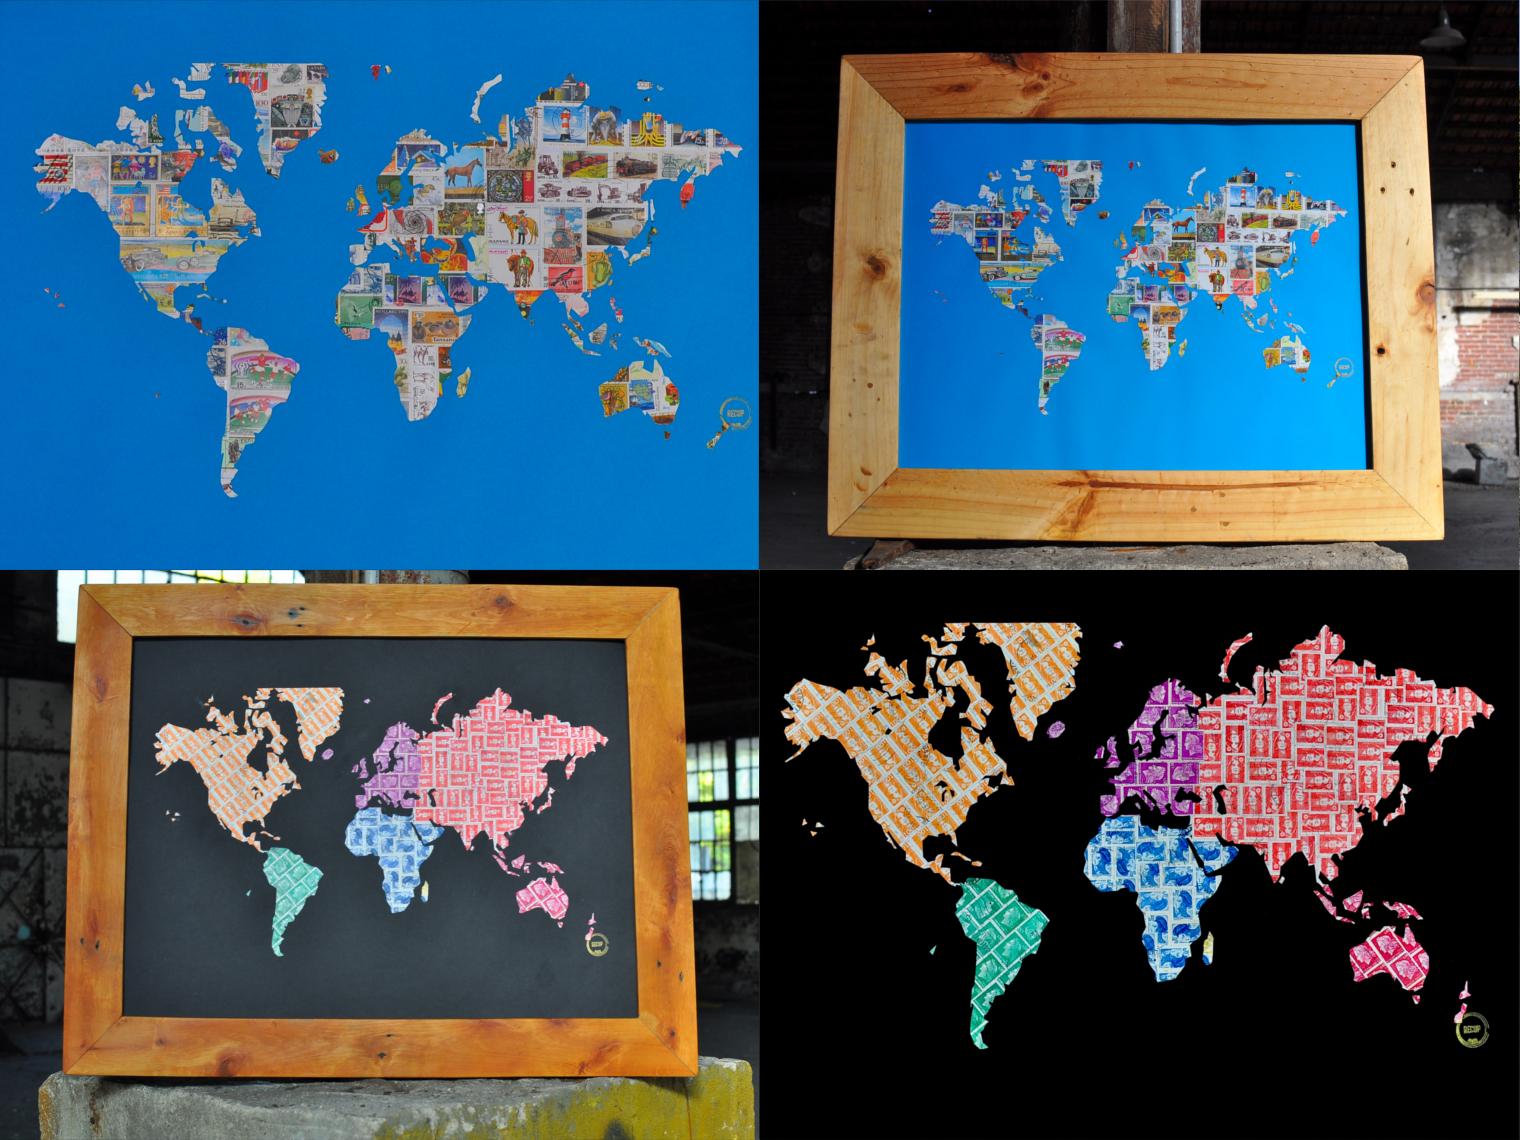 images_for_kickstarter_-_World_Maps-1478718833.jpeg